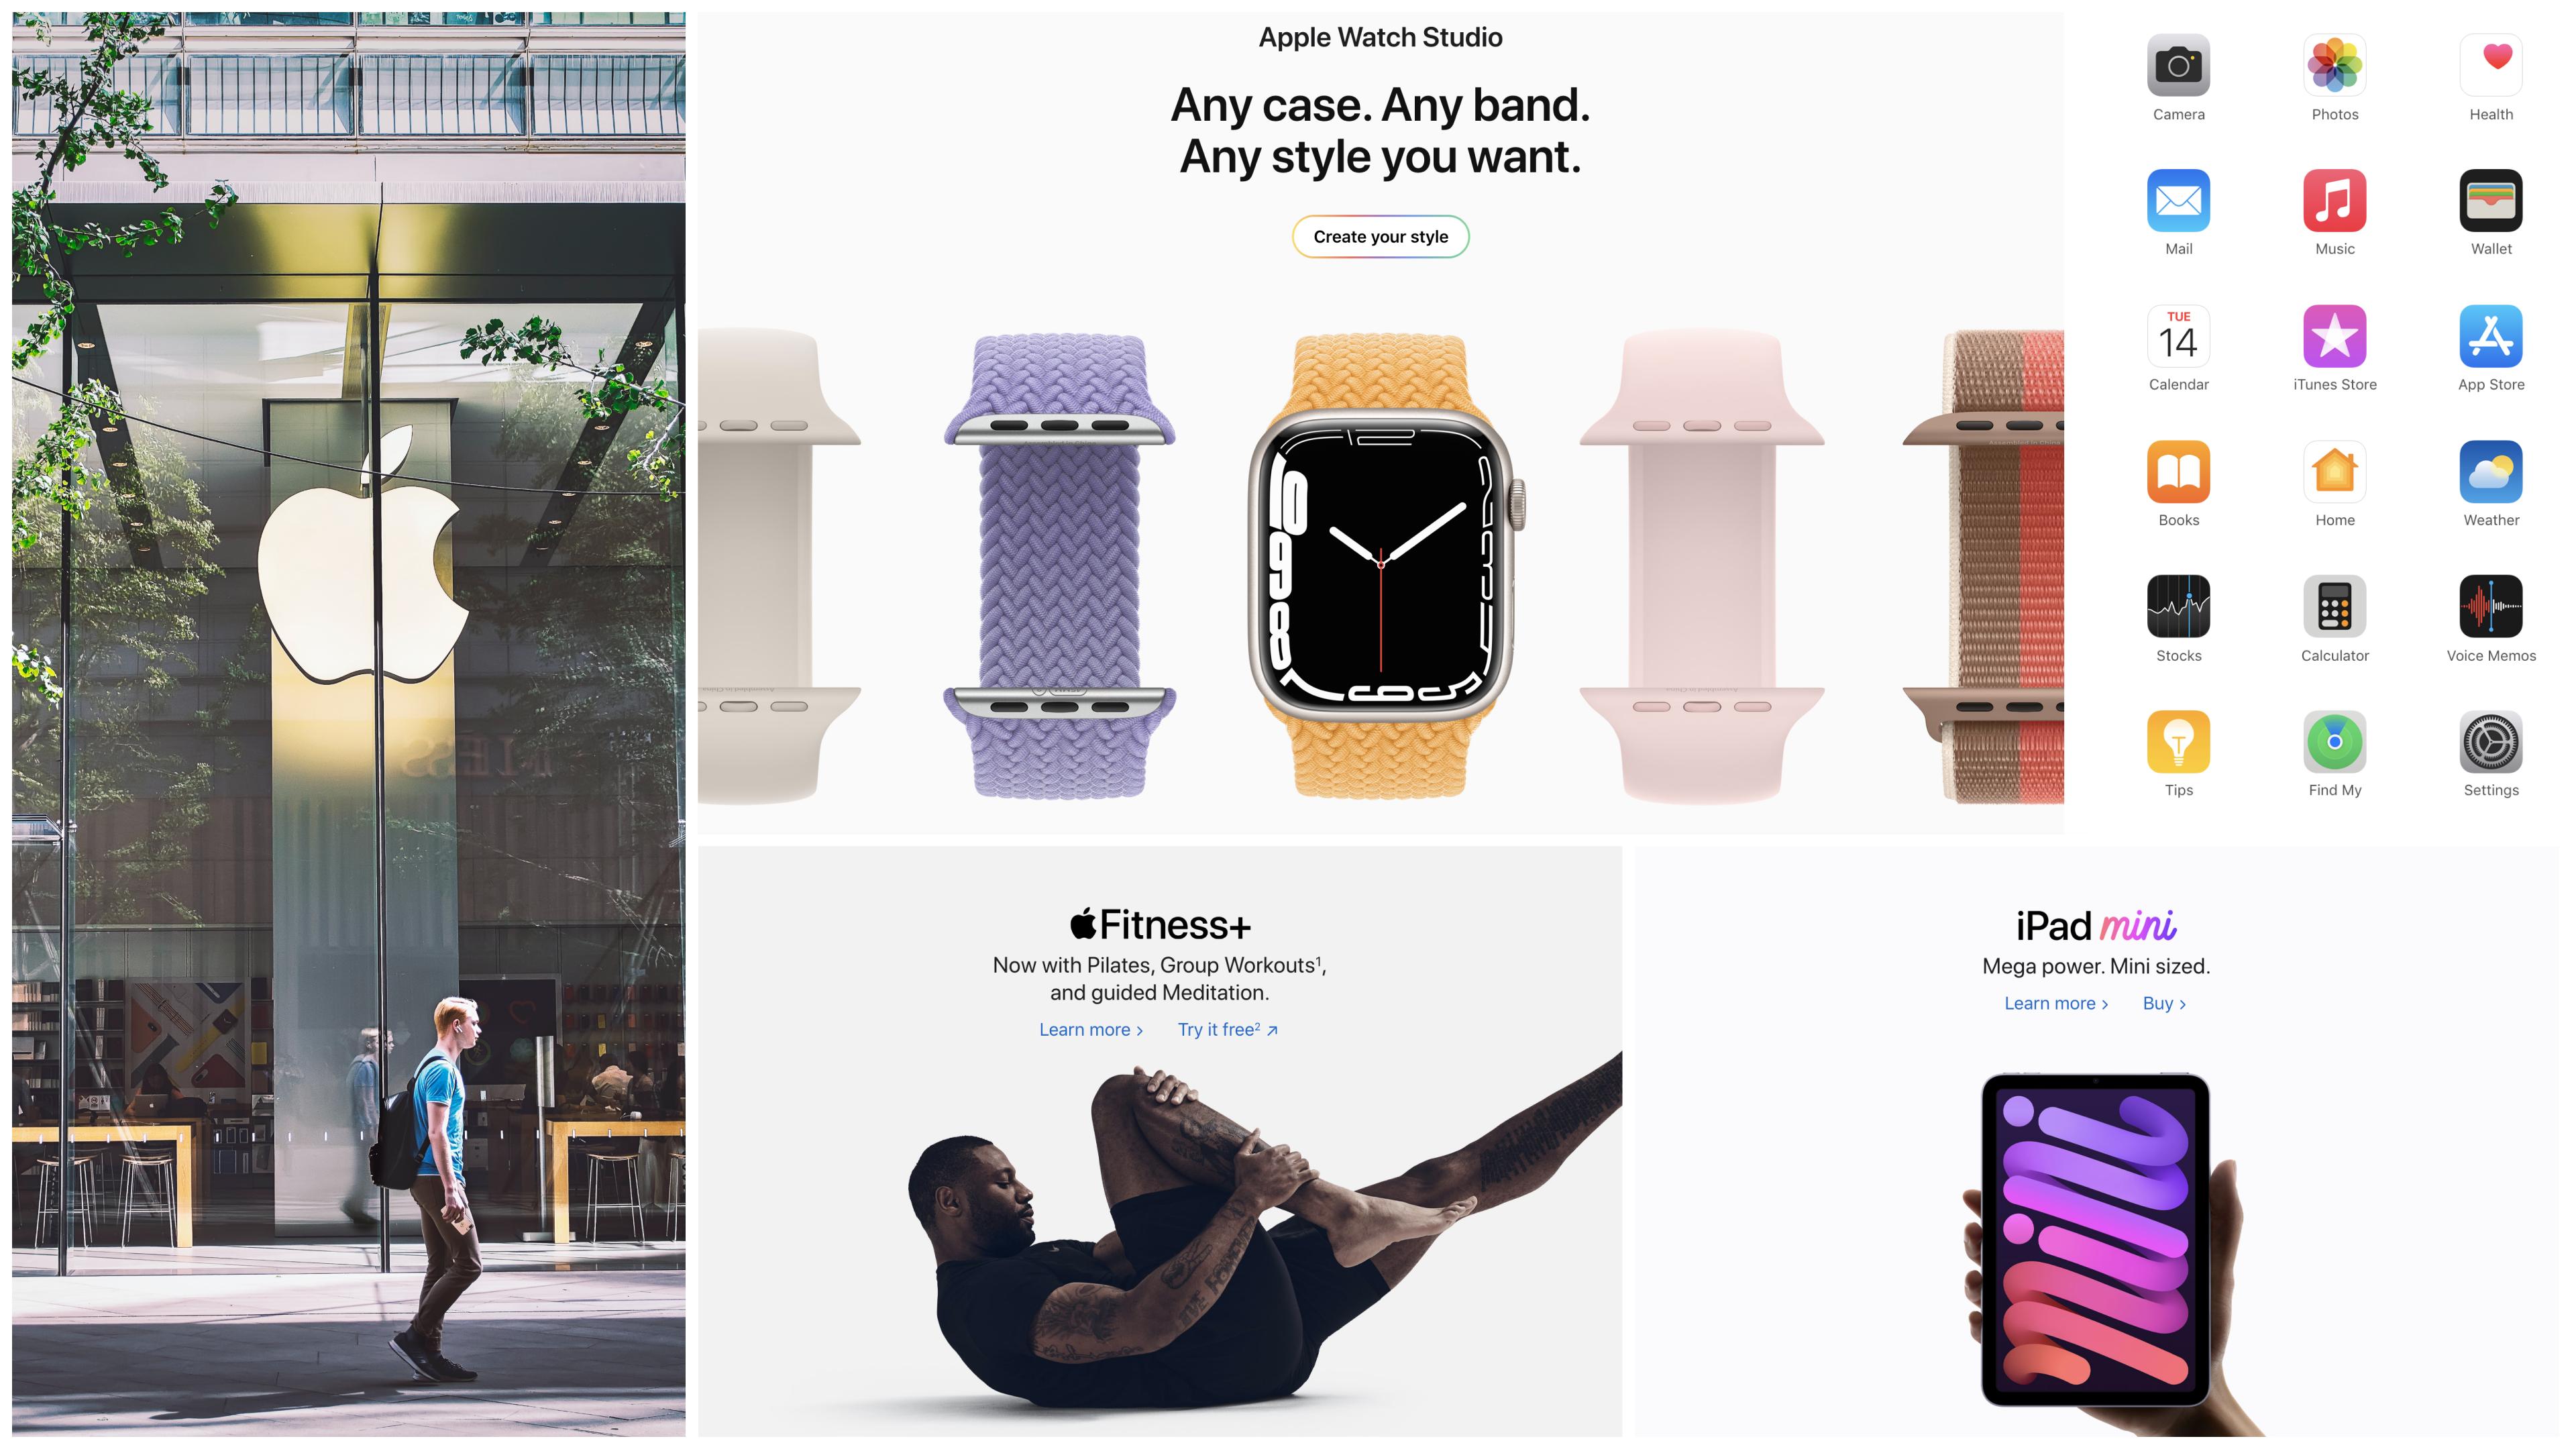 lms design - cross platform brand continuity example apple